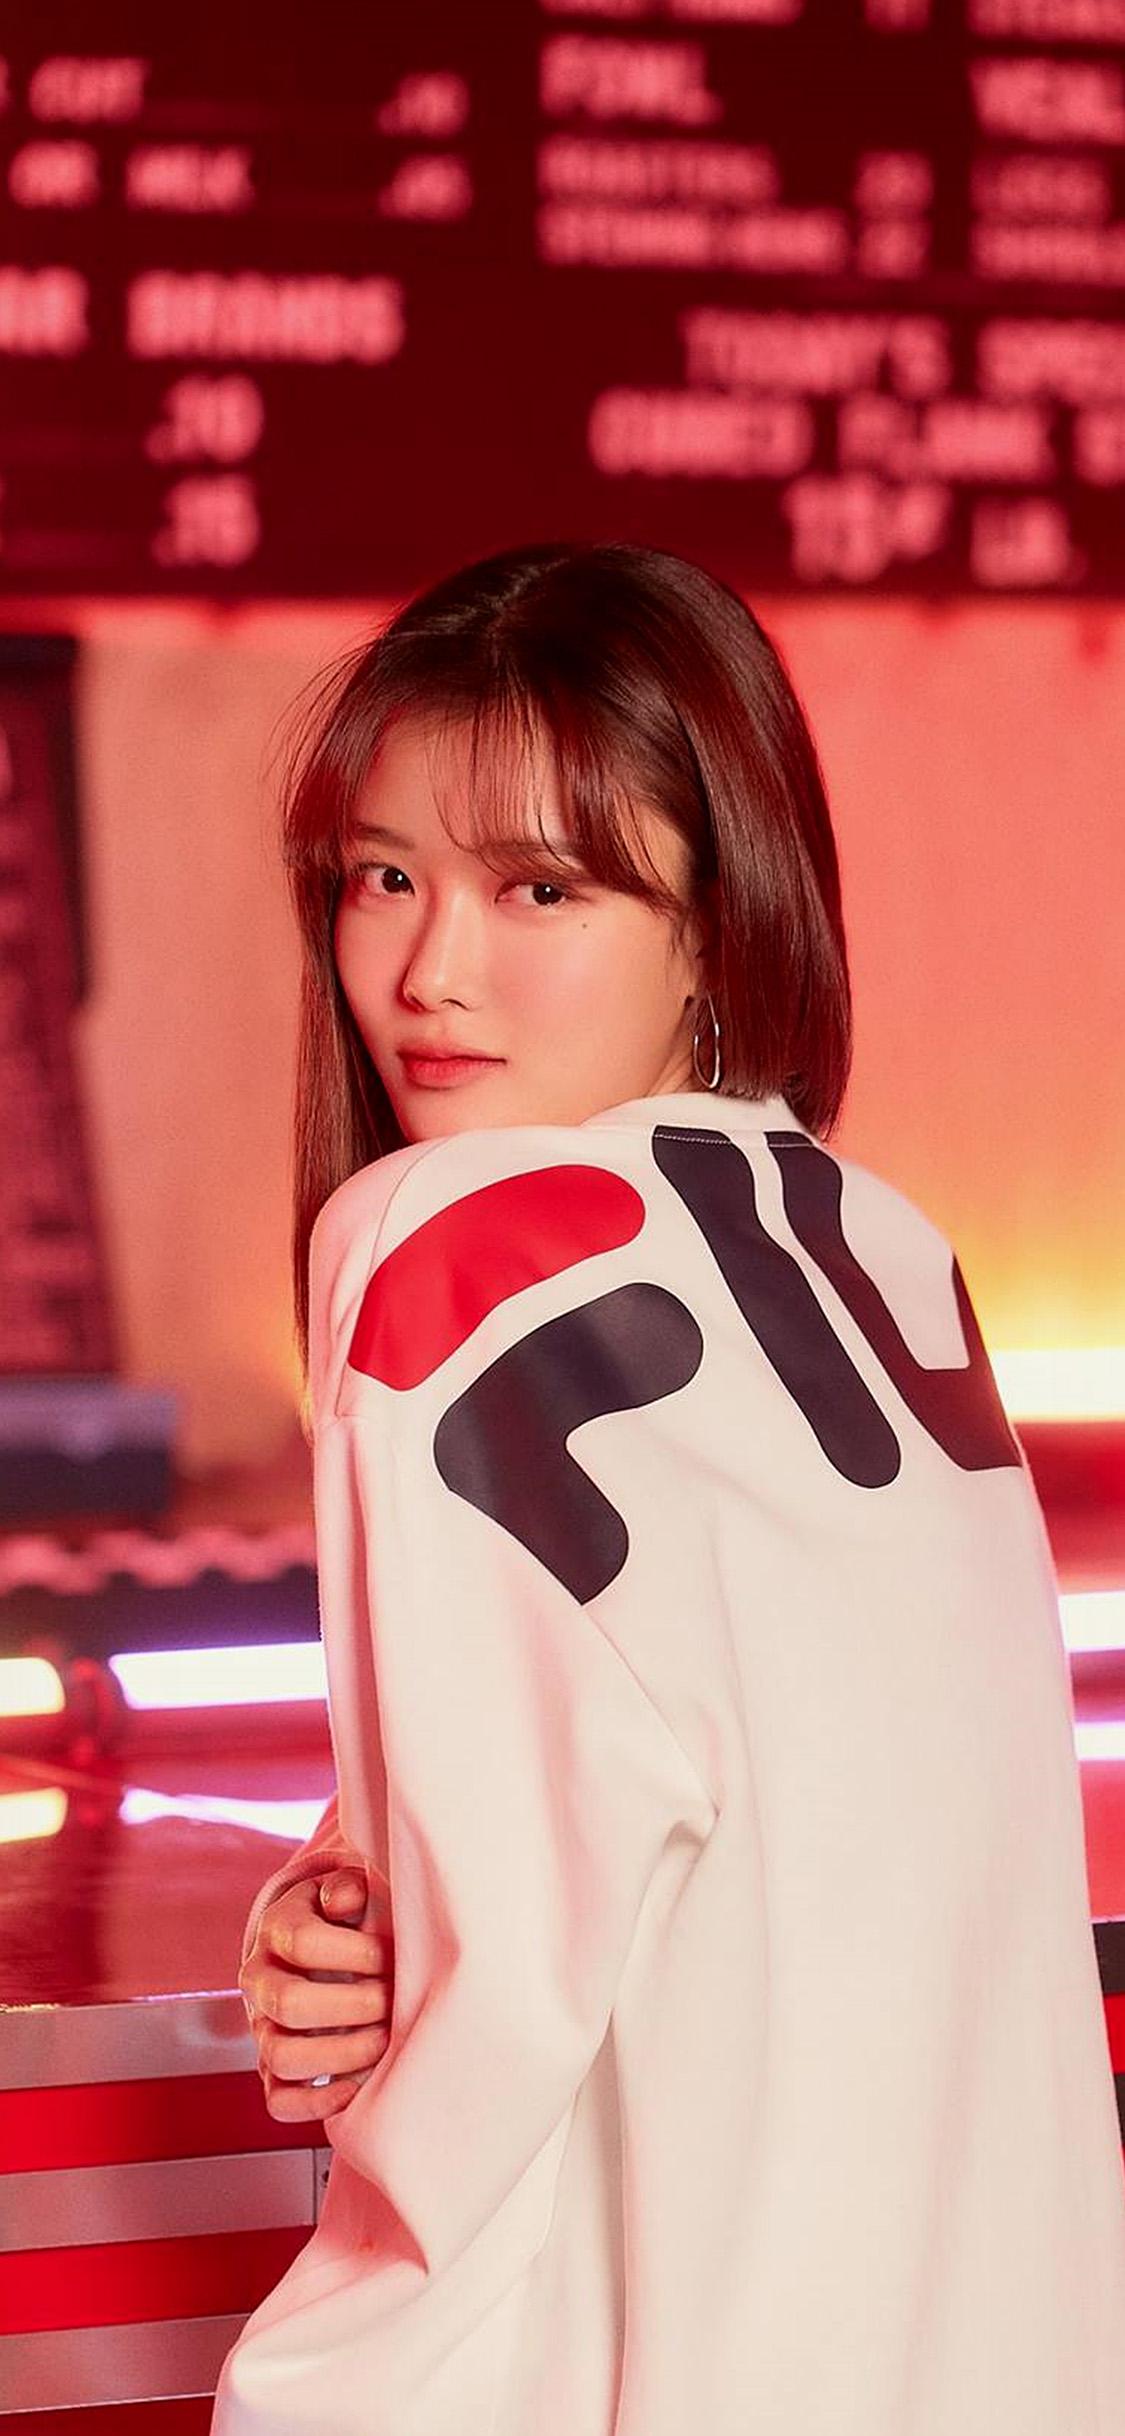 iPhonexpapers.com-Apple-iPhone-wallpaper-hs22-girl-kpop-red-fila-yujung-film